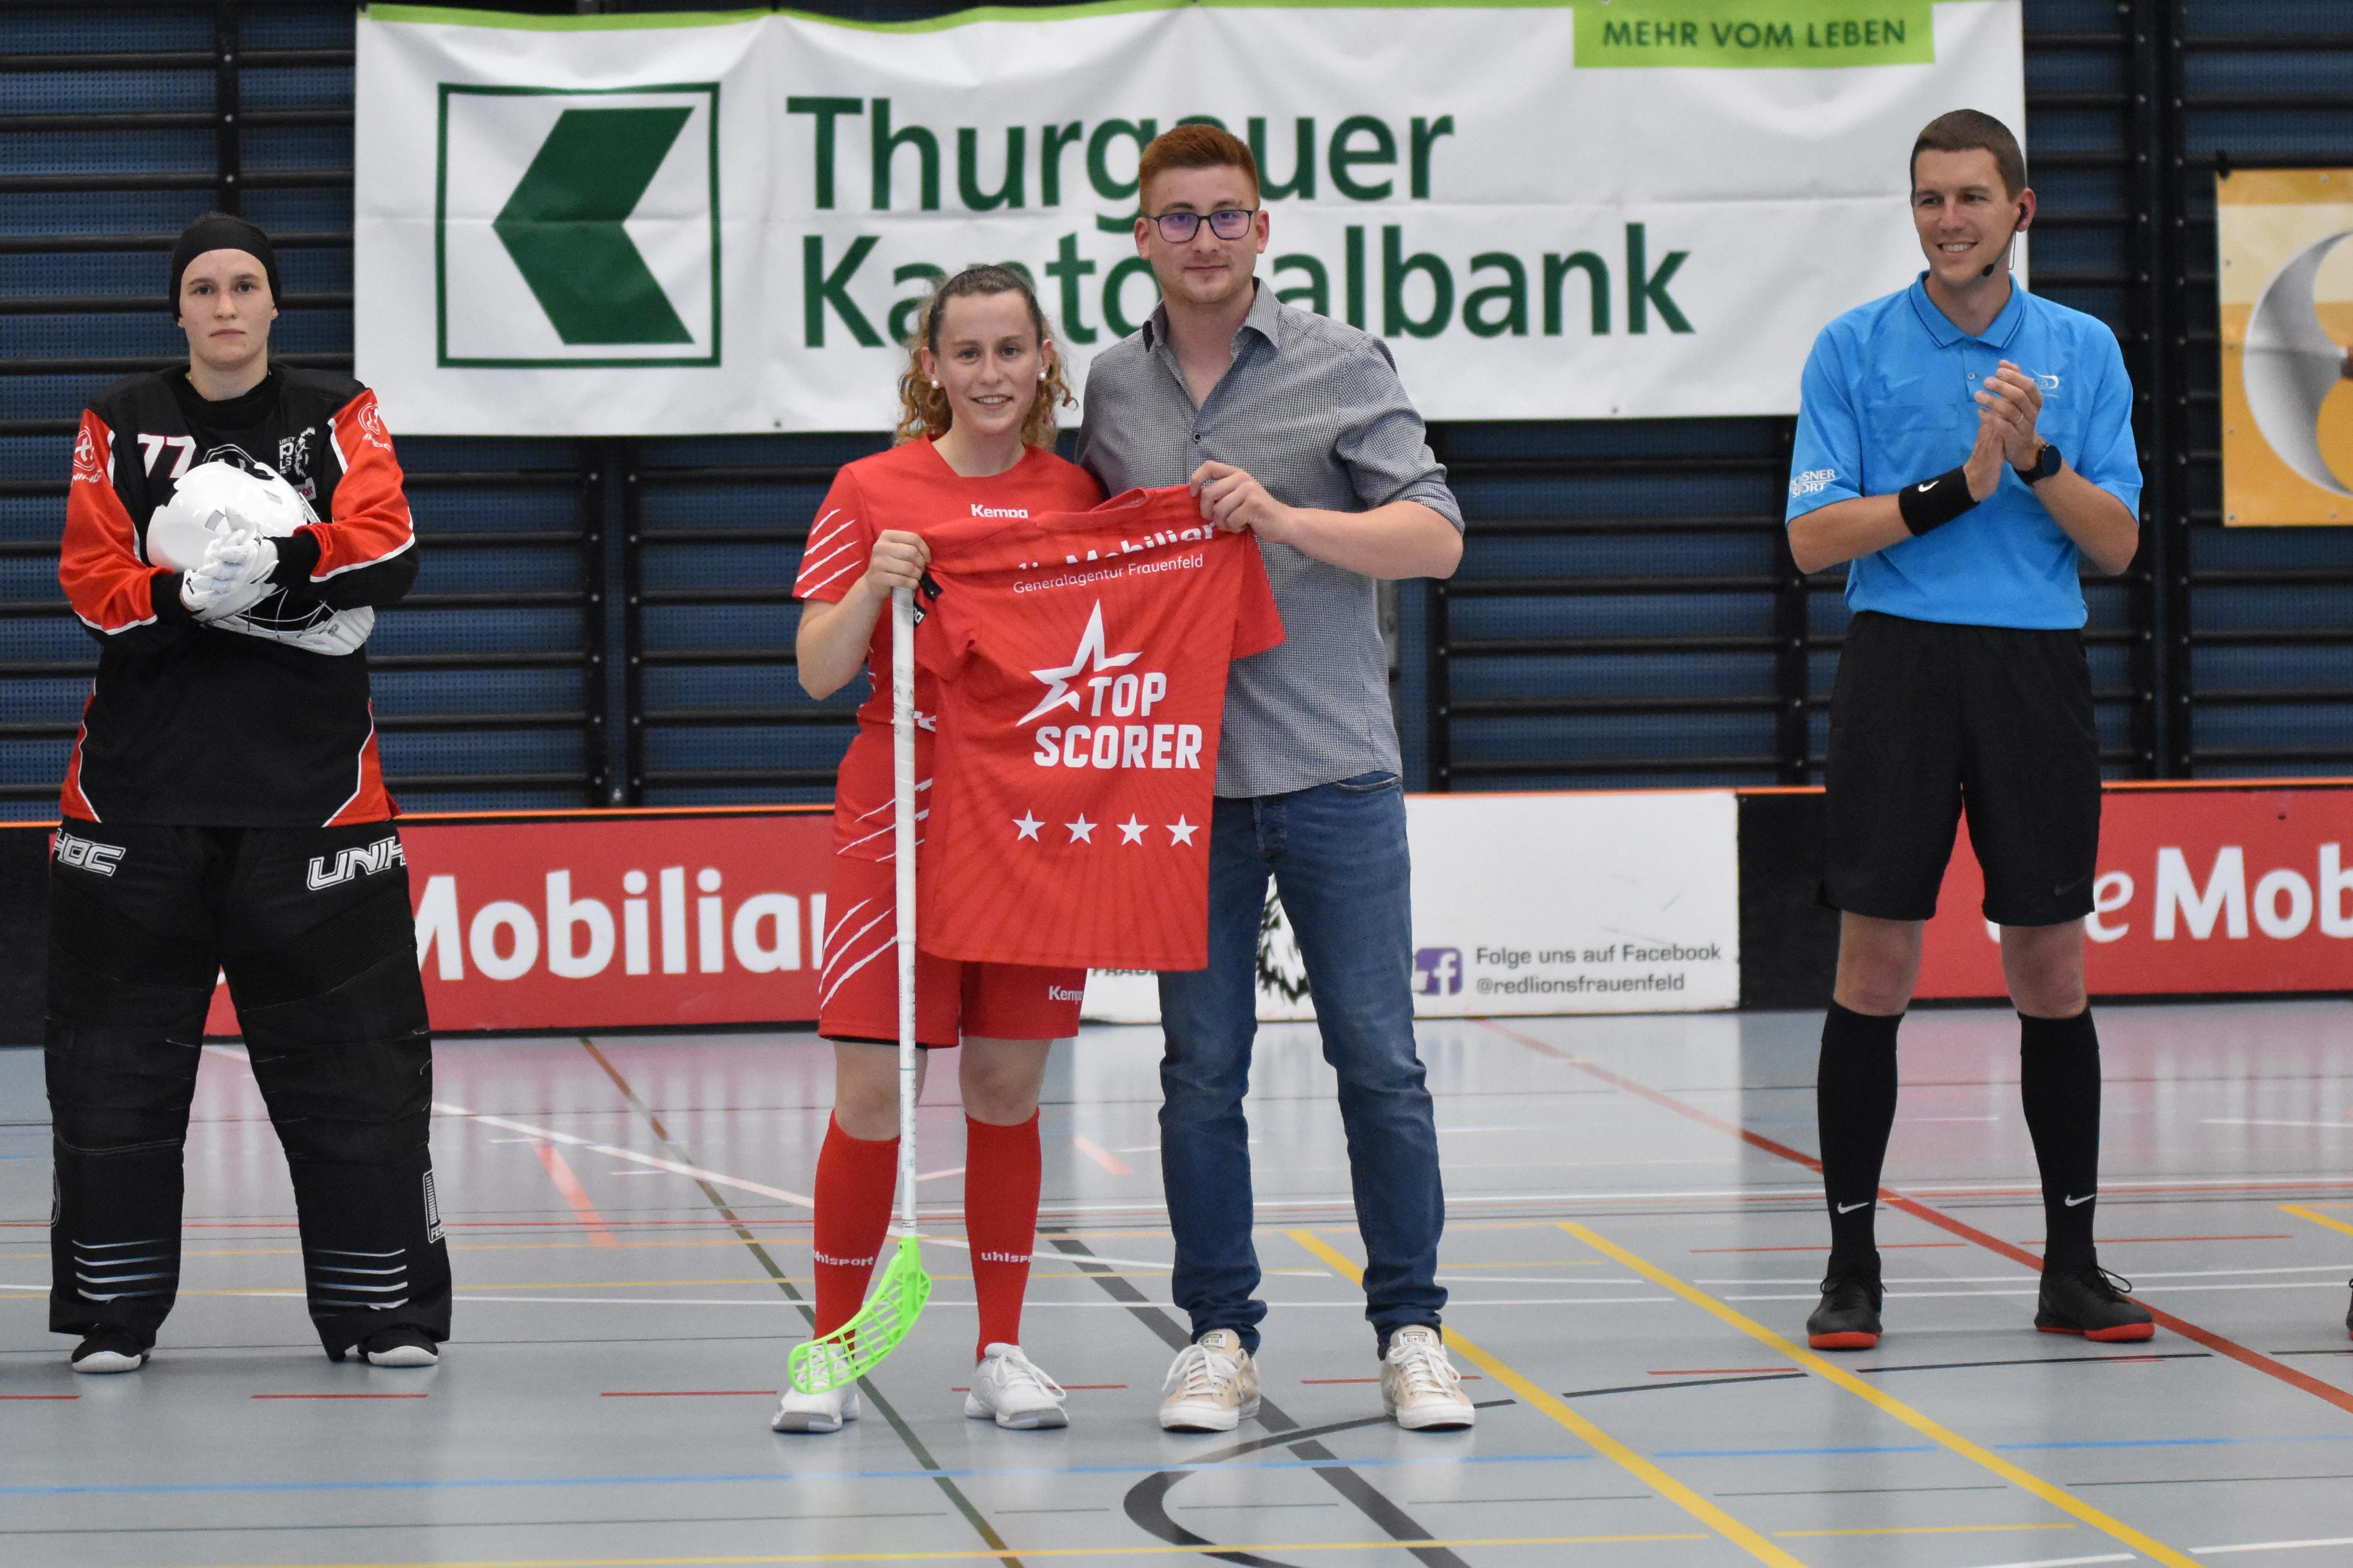 Übergabe des Topscorer-Shirts von Chiaro Tomaselli, Mobiliar GA Frauenfeld, an Captain Viviane Lenz.